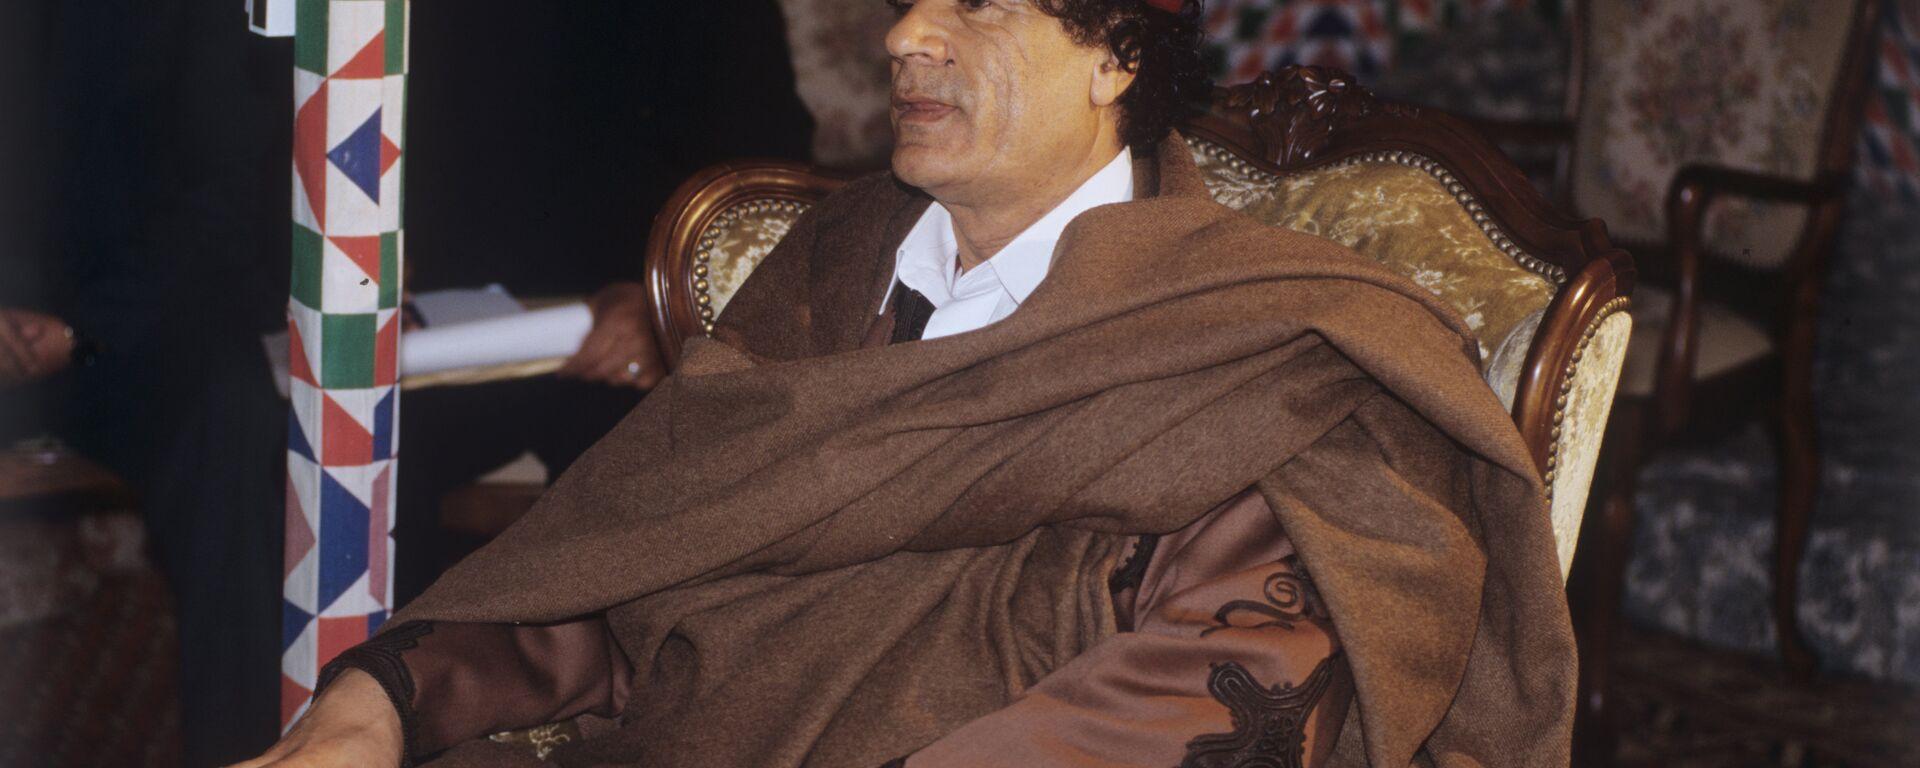 Muammar al-Gaddafi, leader of Libya was accorded the honorific Guide of the First of September Great Revolution of the Socialist People's Libyan Arab Jamahiriya. (File) - Sputnik International, 1920, 06.09.2021